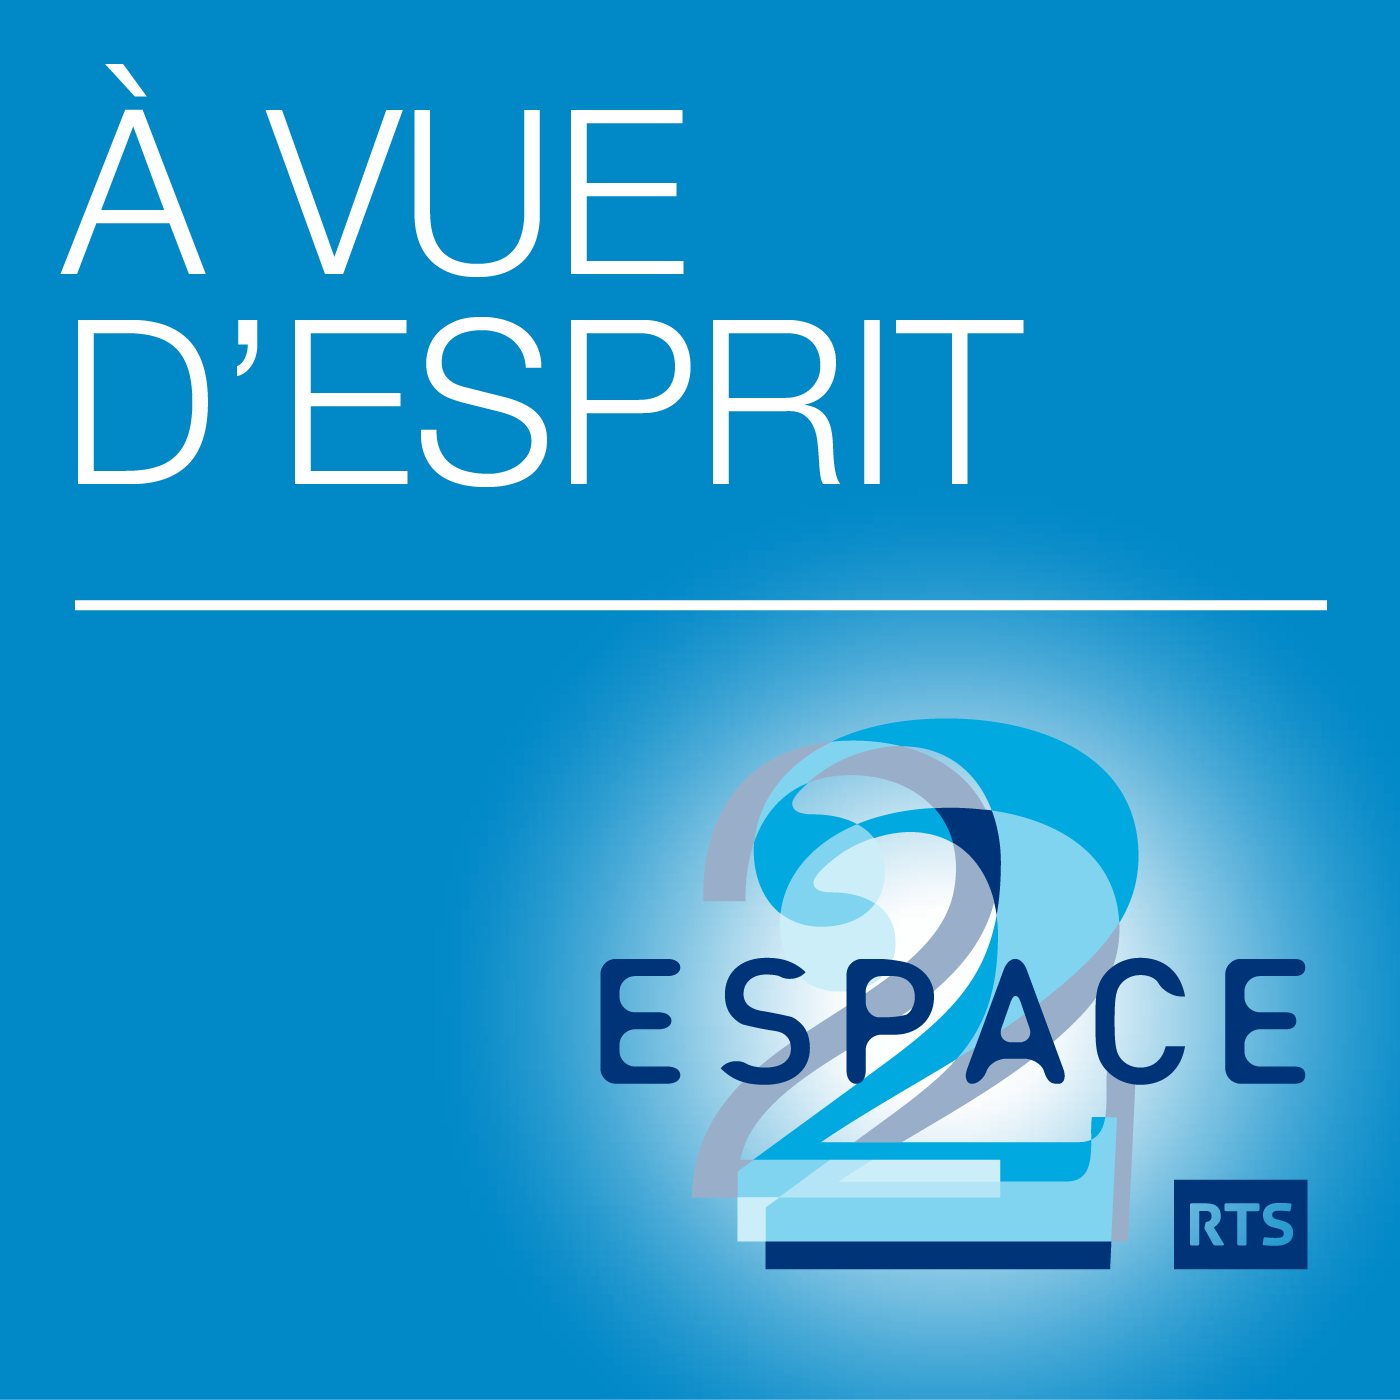 A vue d'esprit - Espace 2